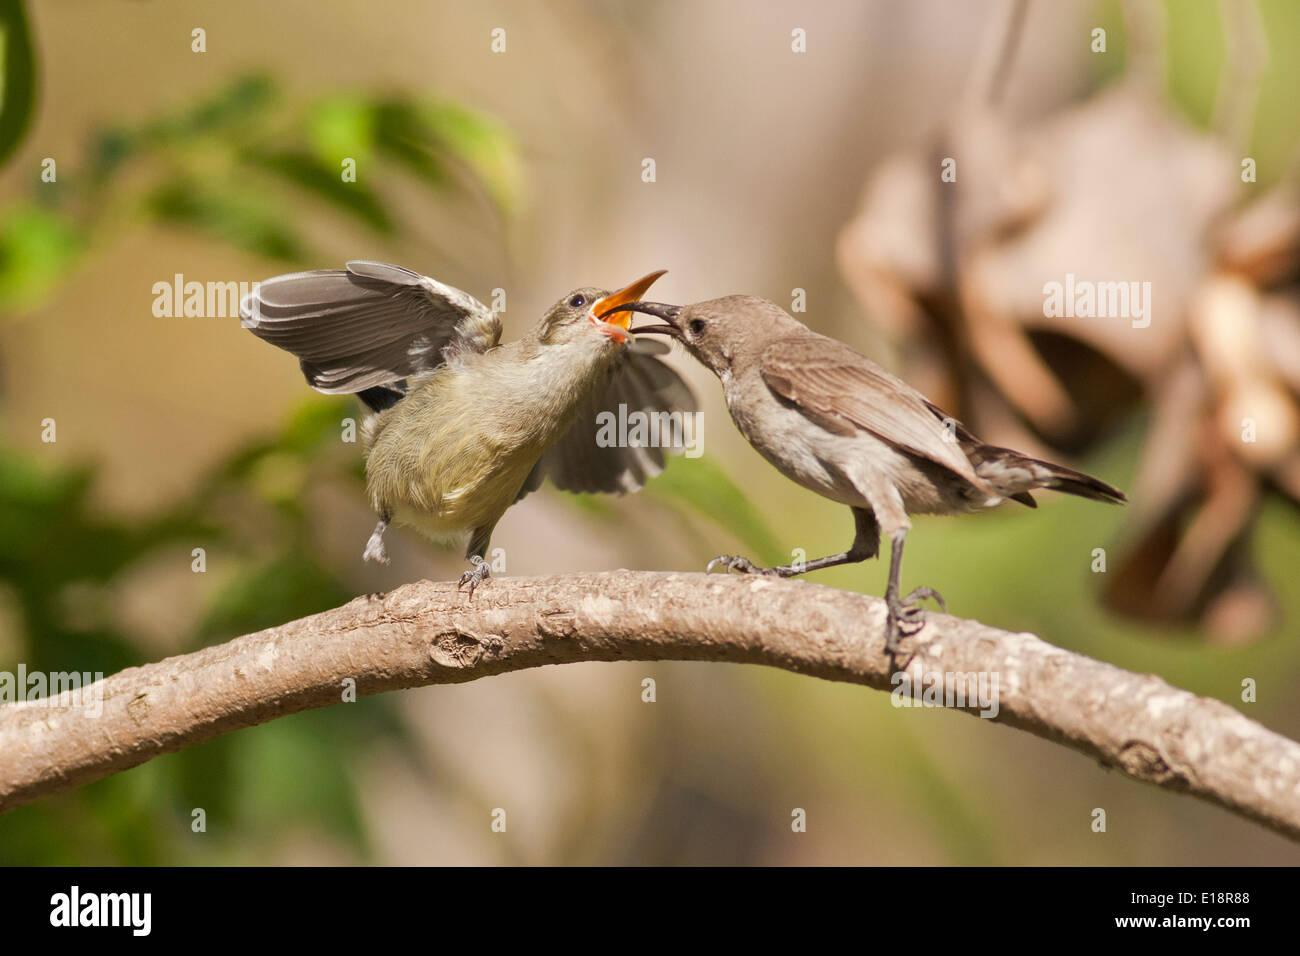 Female Palestine Sunbird or Northern Orange-tufted Sunbird (Cinnyris oseus) feeds a young hatchling. - Stock Image